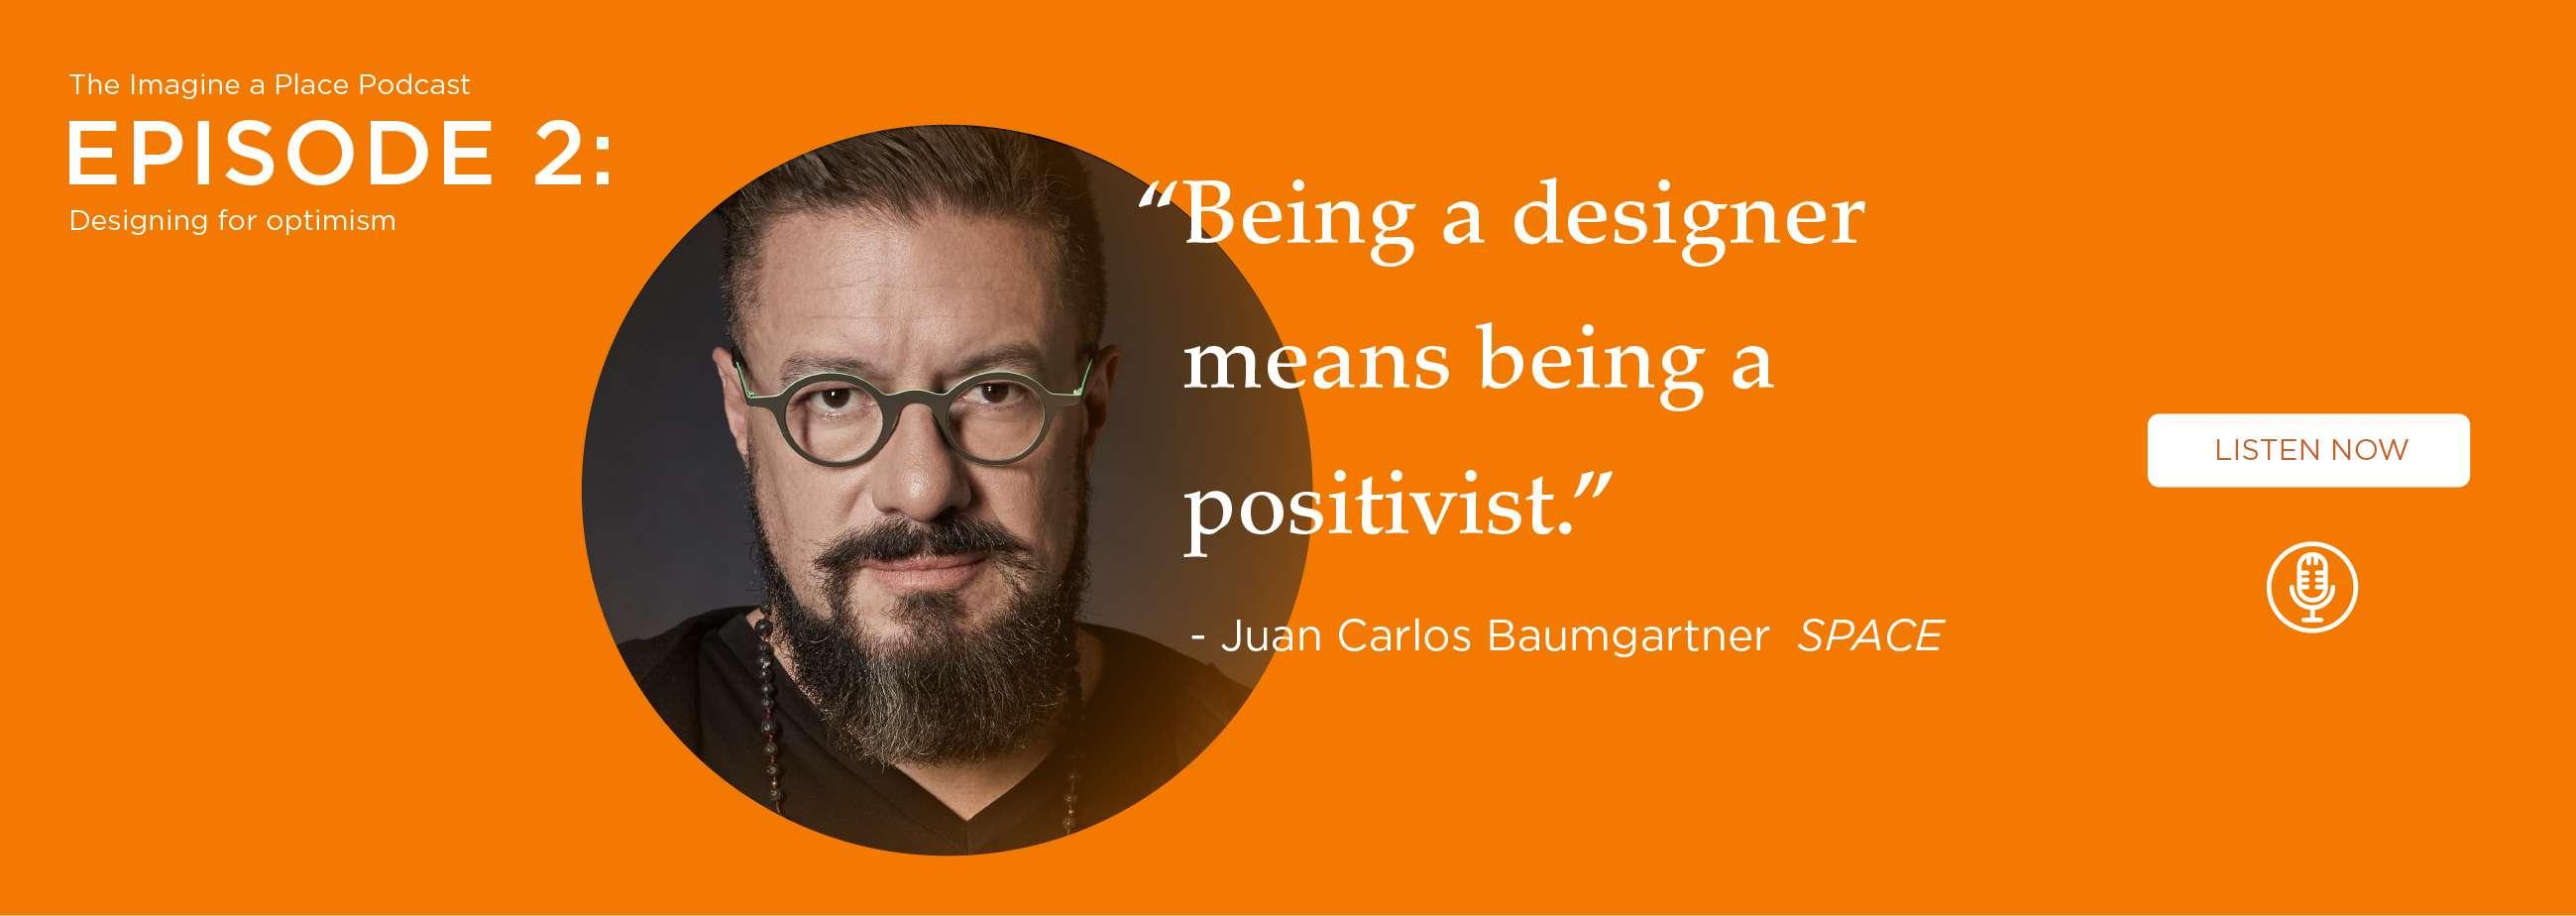 Juan Carlos Baumgartner (SPACE): Designing for optimism. - Ep. 02